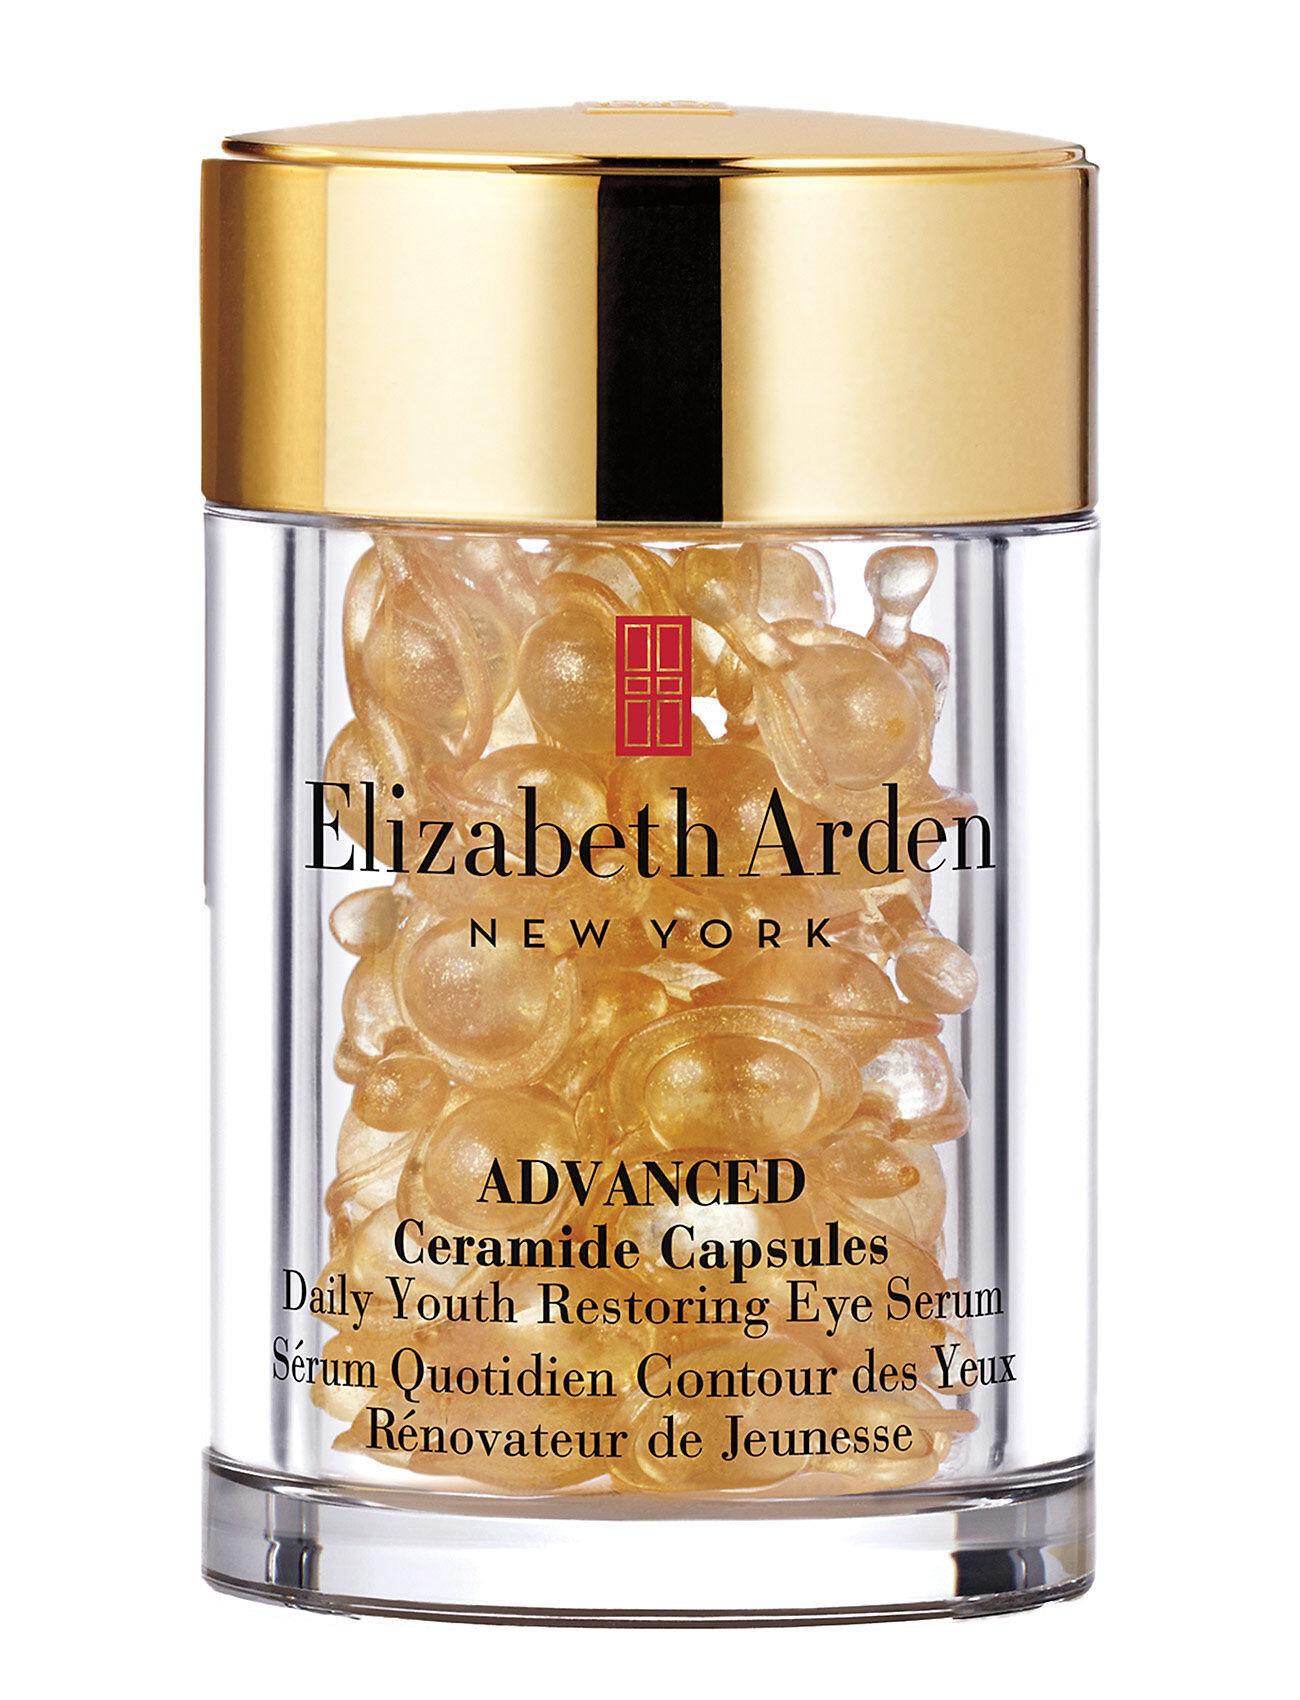 Elizabeth Arden Ceramide Capsules Restoring Eye Serum 60pcs Seerumi Kasvot Ihonhoito Nude Elizabeth Arden